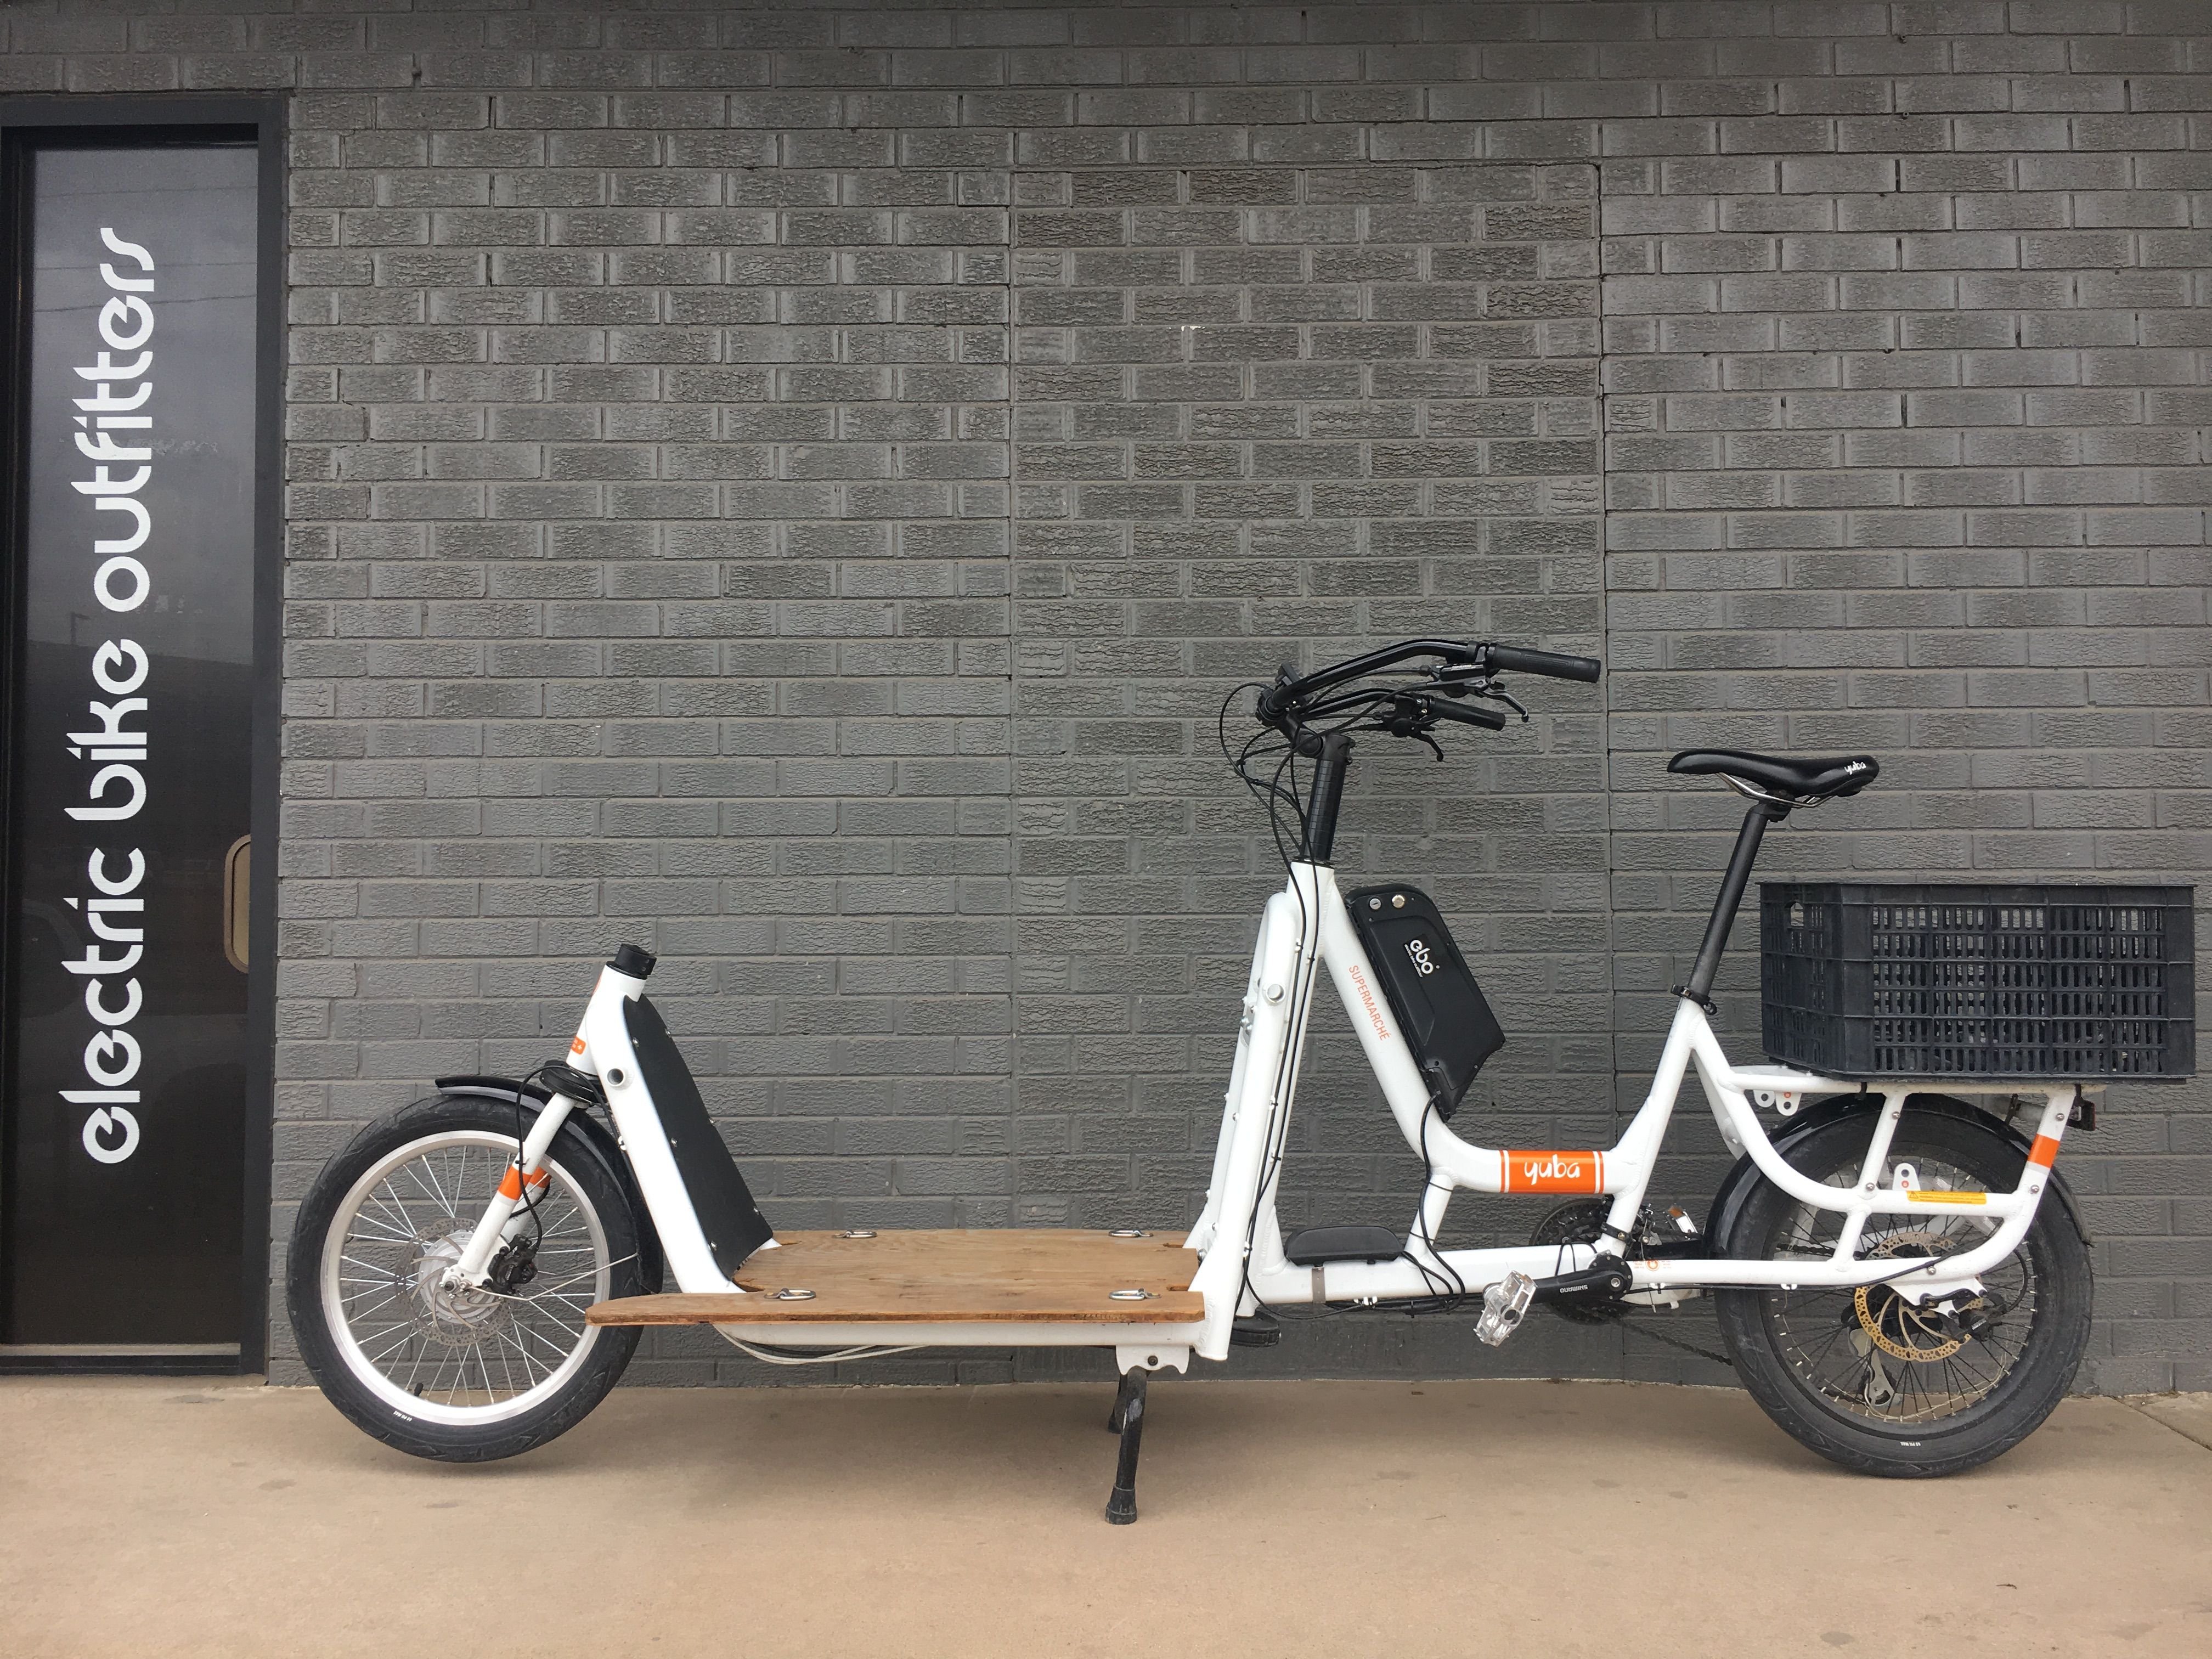 Ebo 48v Burly Electric Bike Conversion Kit Installed On A Yuba Supermarche Electric Bike Conversion Family Bike Electric Bike